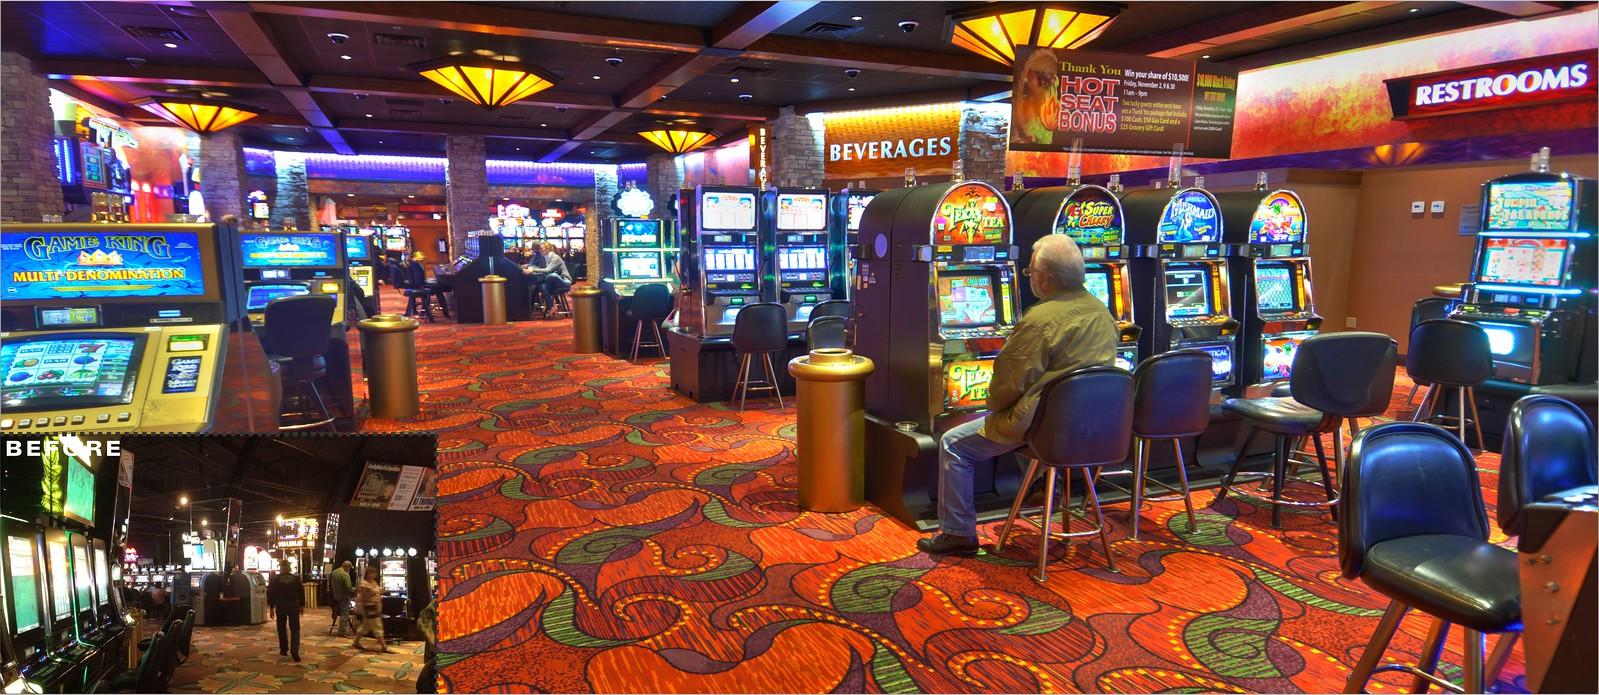 plaza hotel y casino